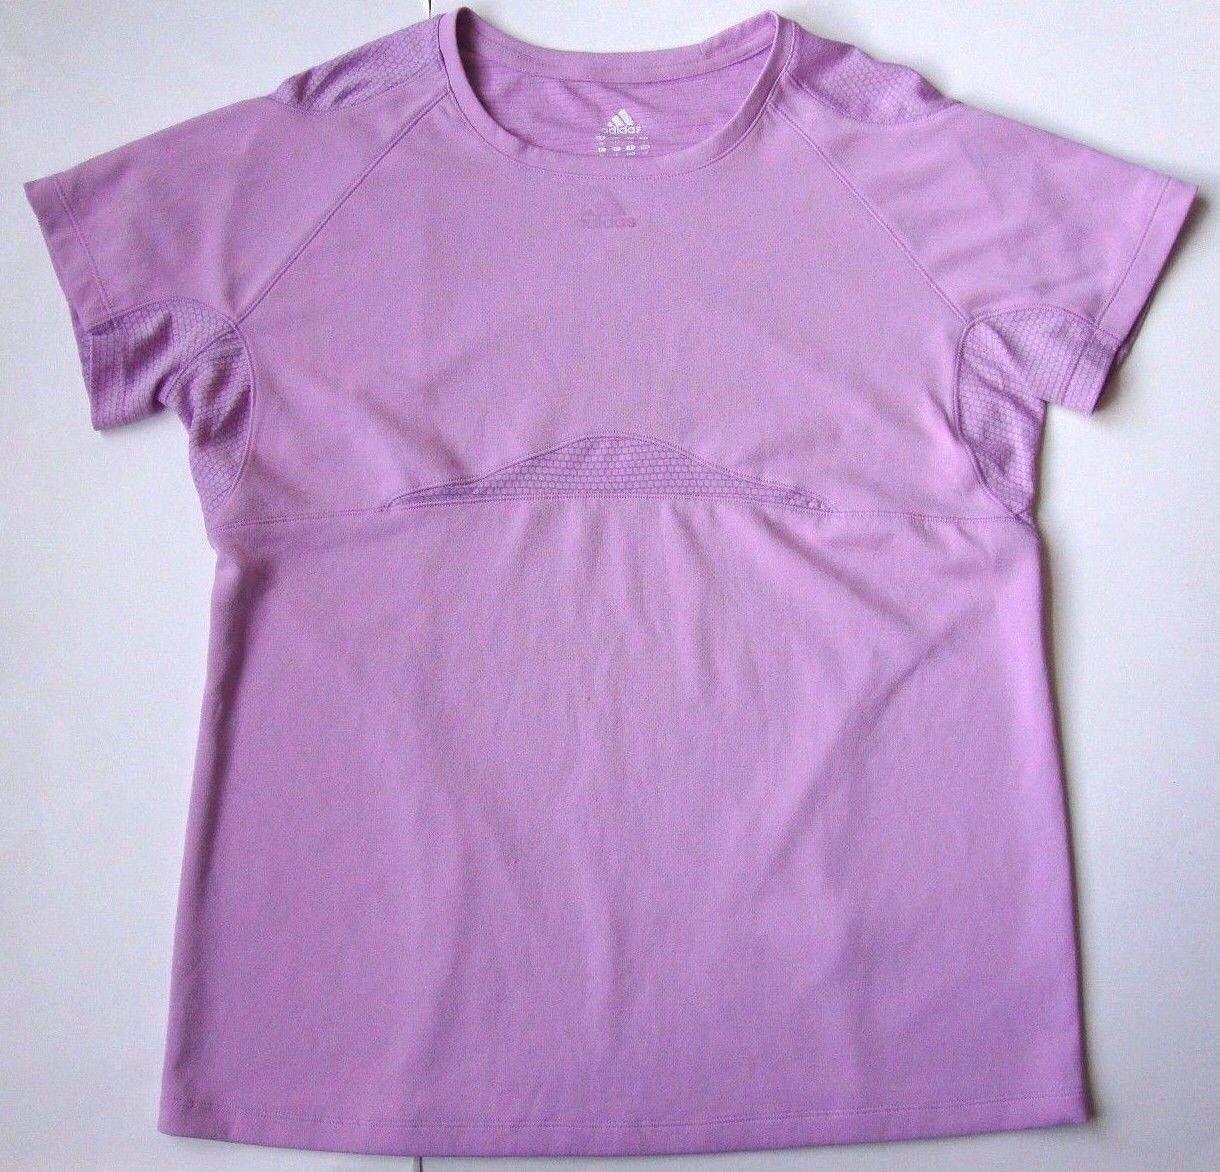 ADIDAS ΓυναικΡίο μέγΡθος πουκάμισο μΡγάλο L